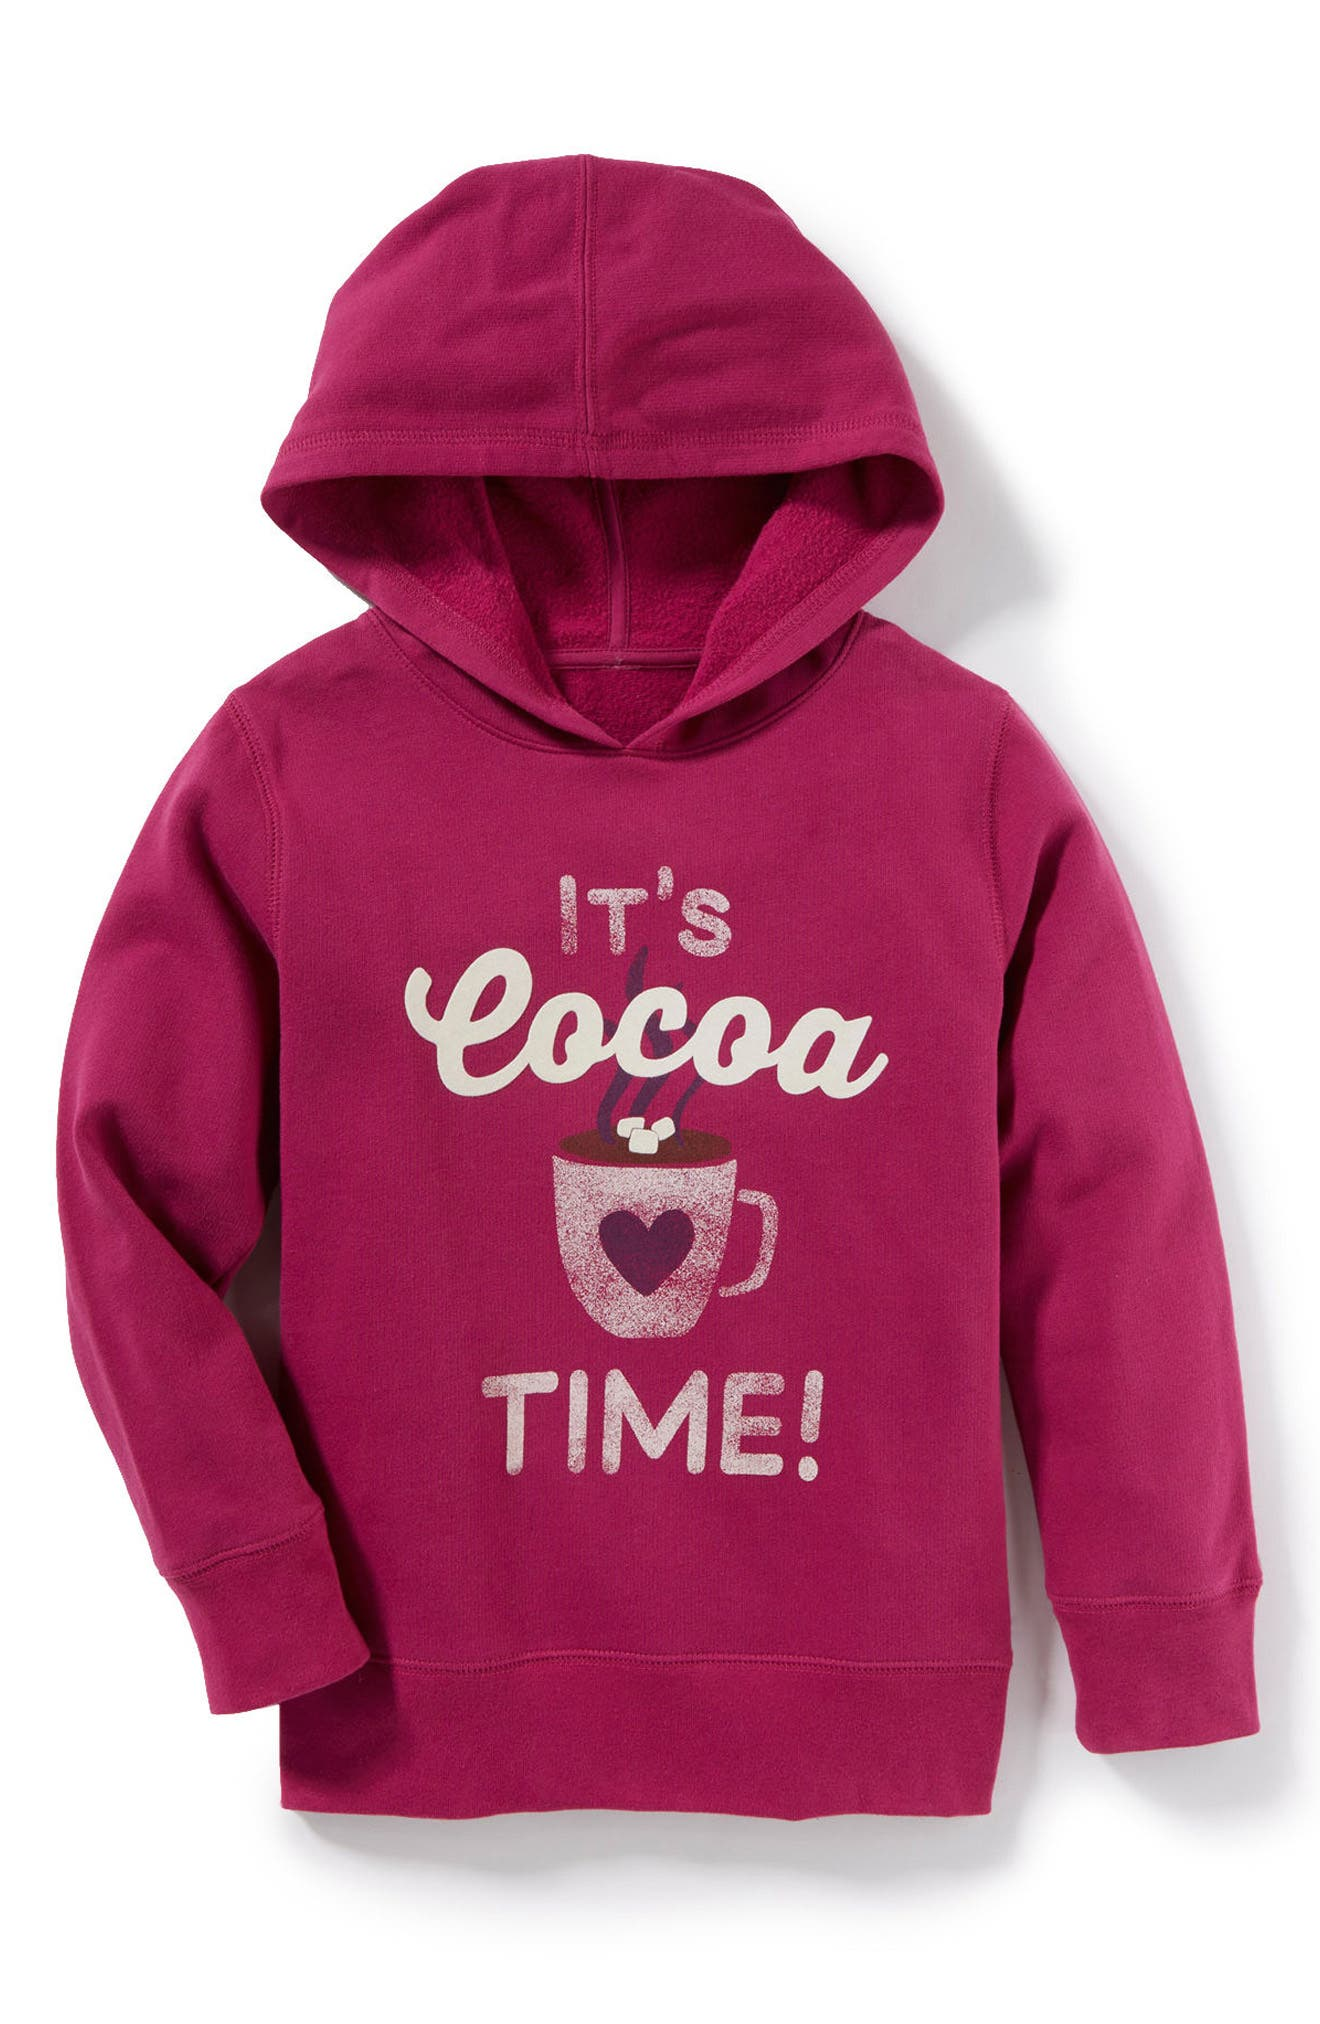 Main Image - Peek It's Cocoa Time Graphic Hoodie (Toddler Girls, Little Girls & Big Girls)